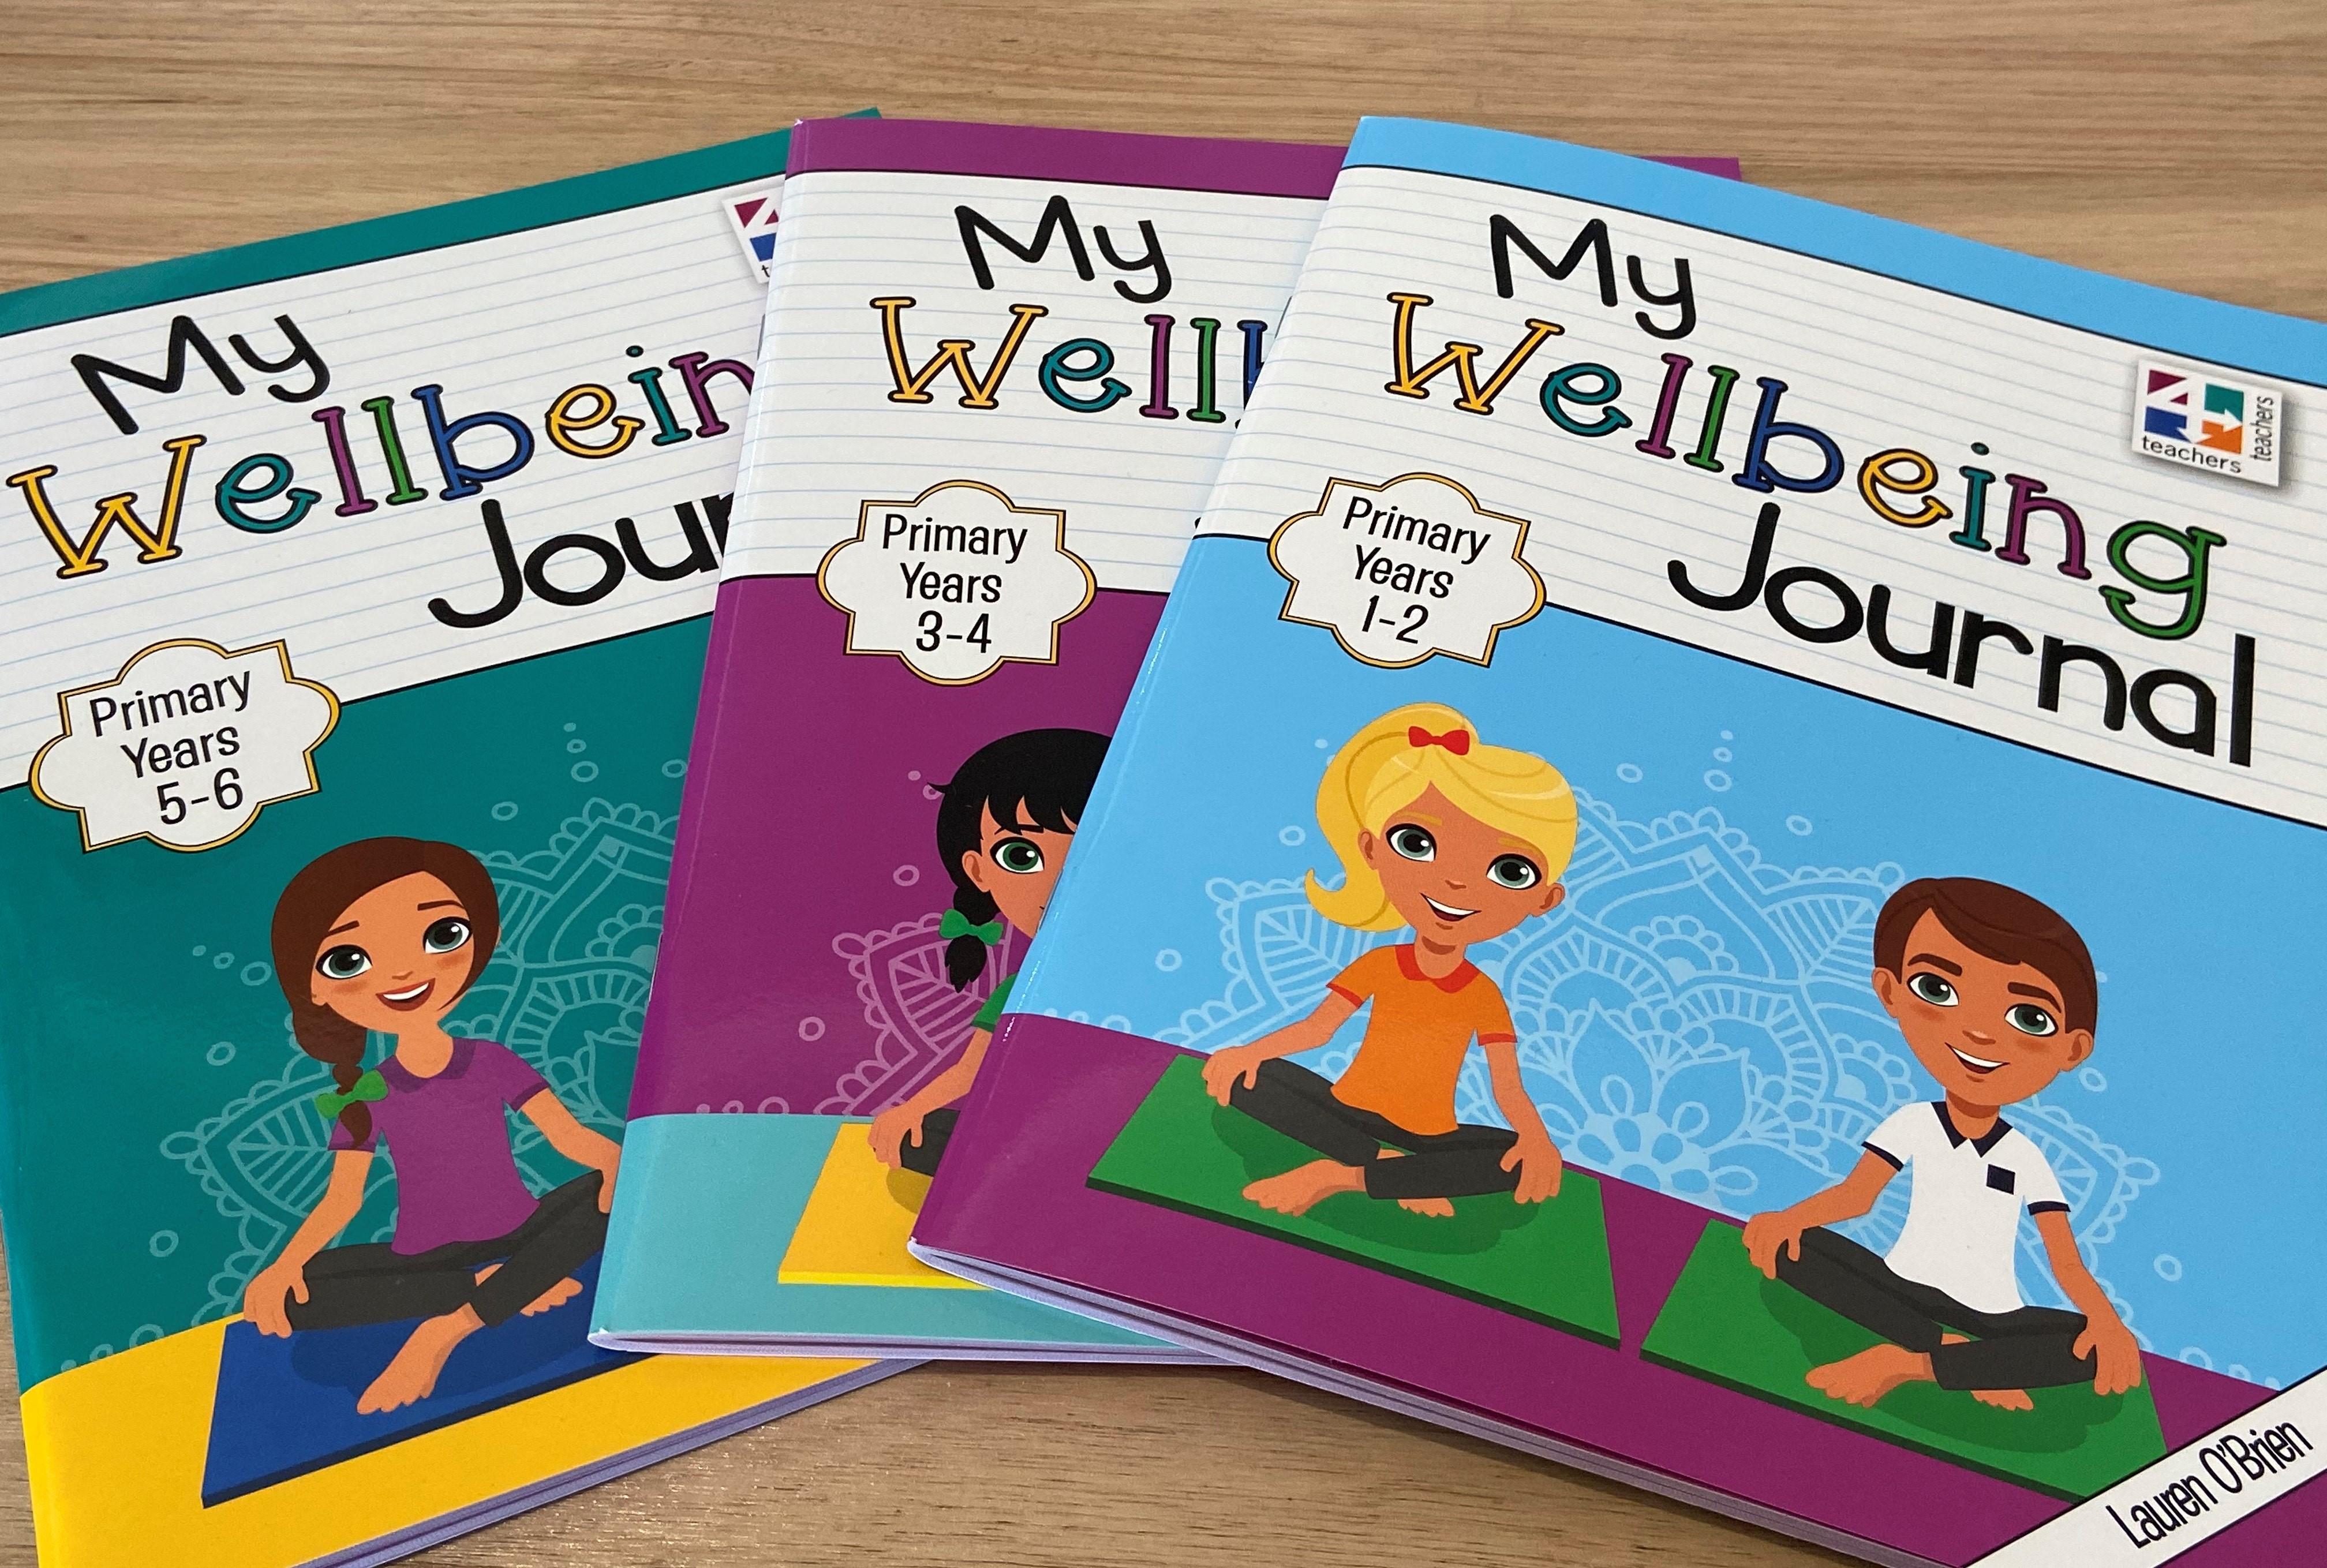 MyWellbeing Journal